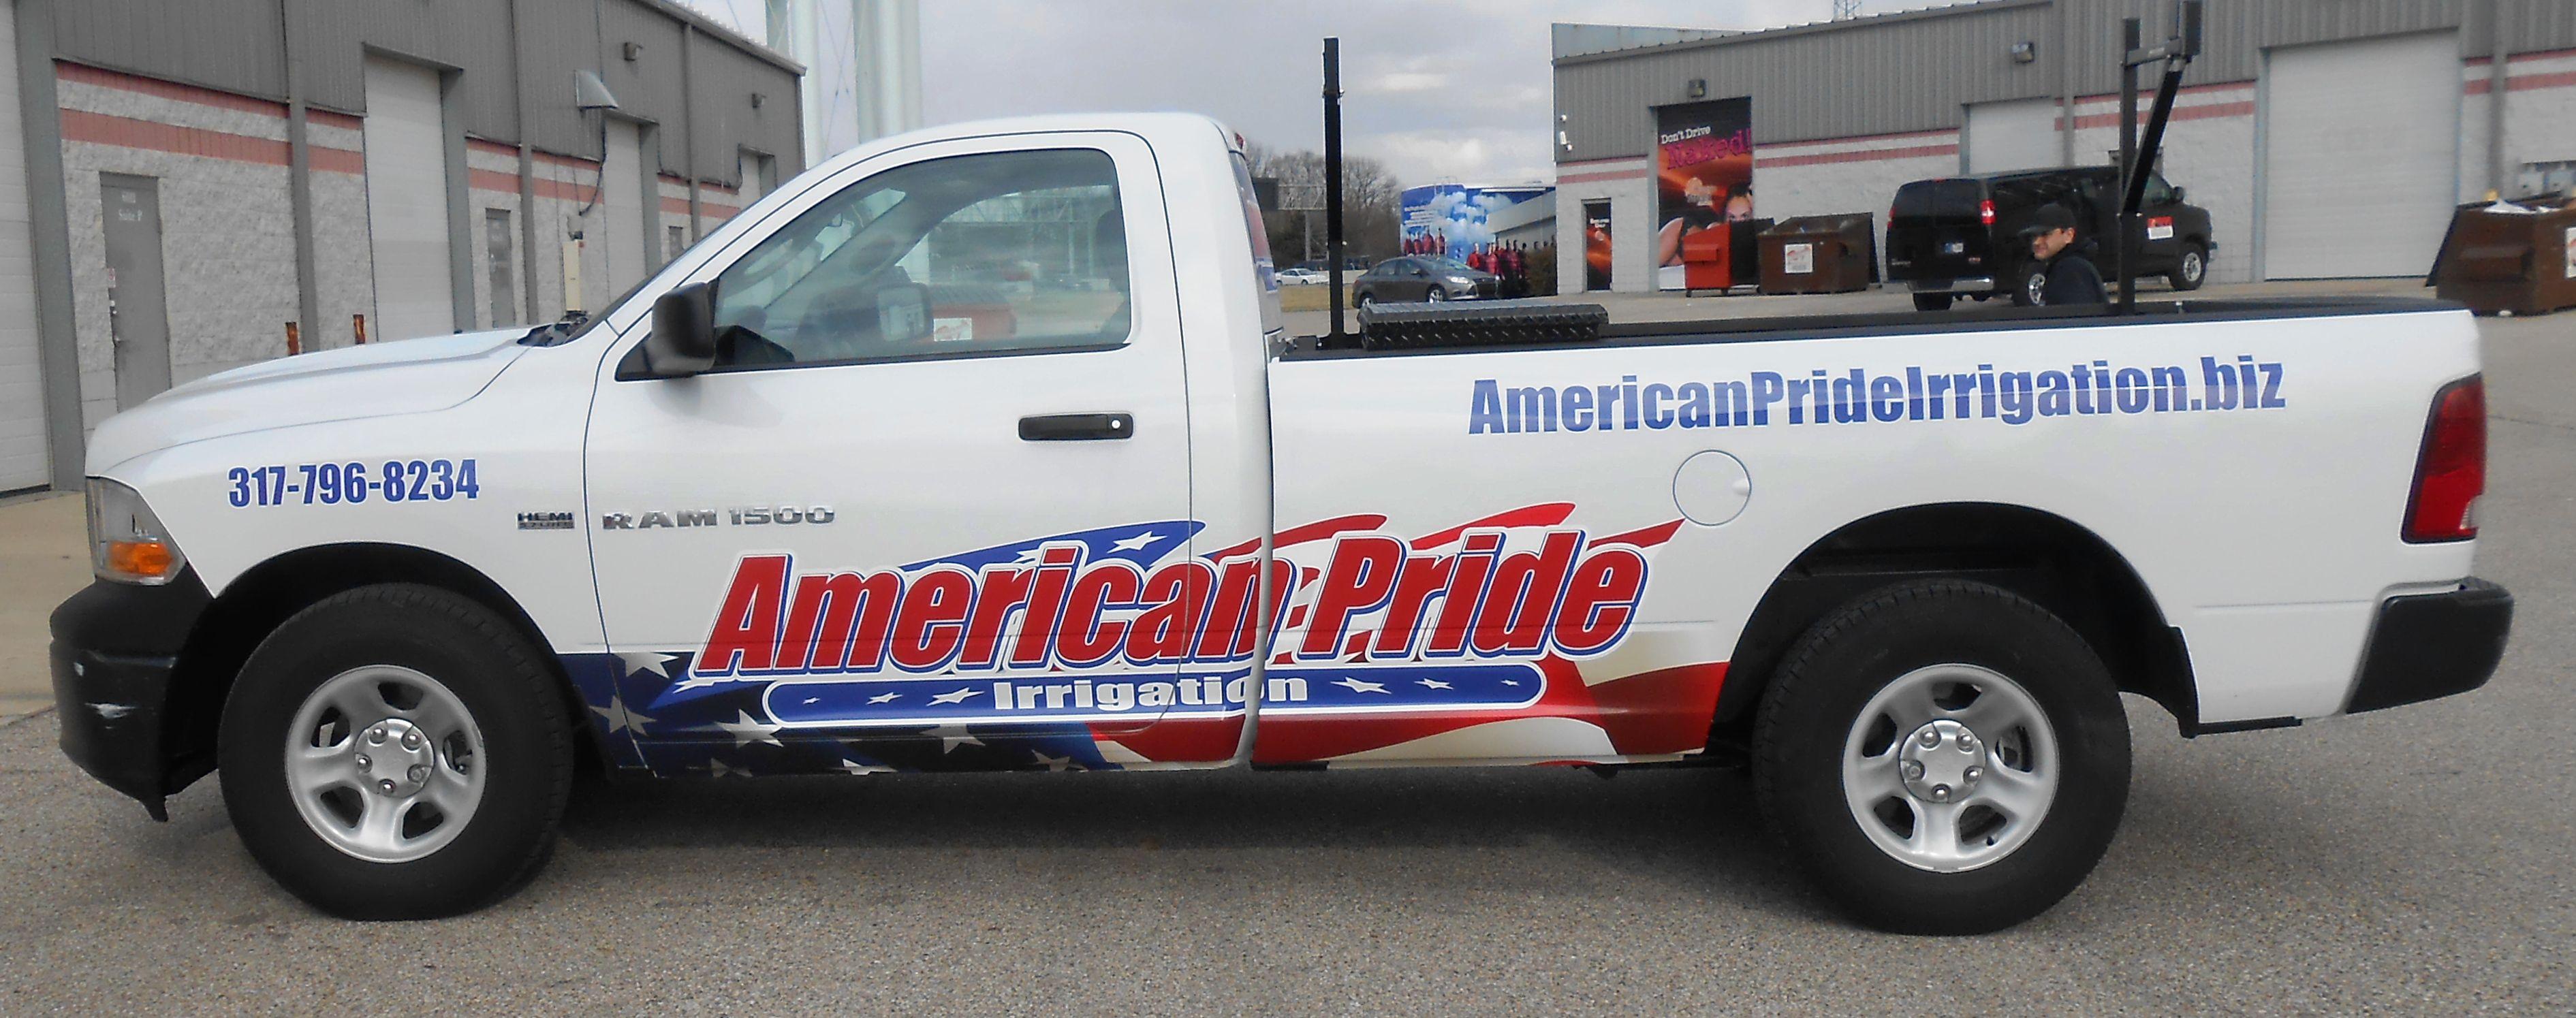 American Pride Irrigation Truck Graphics Vehicle Wrap